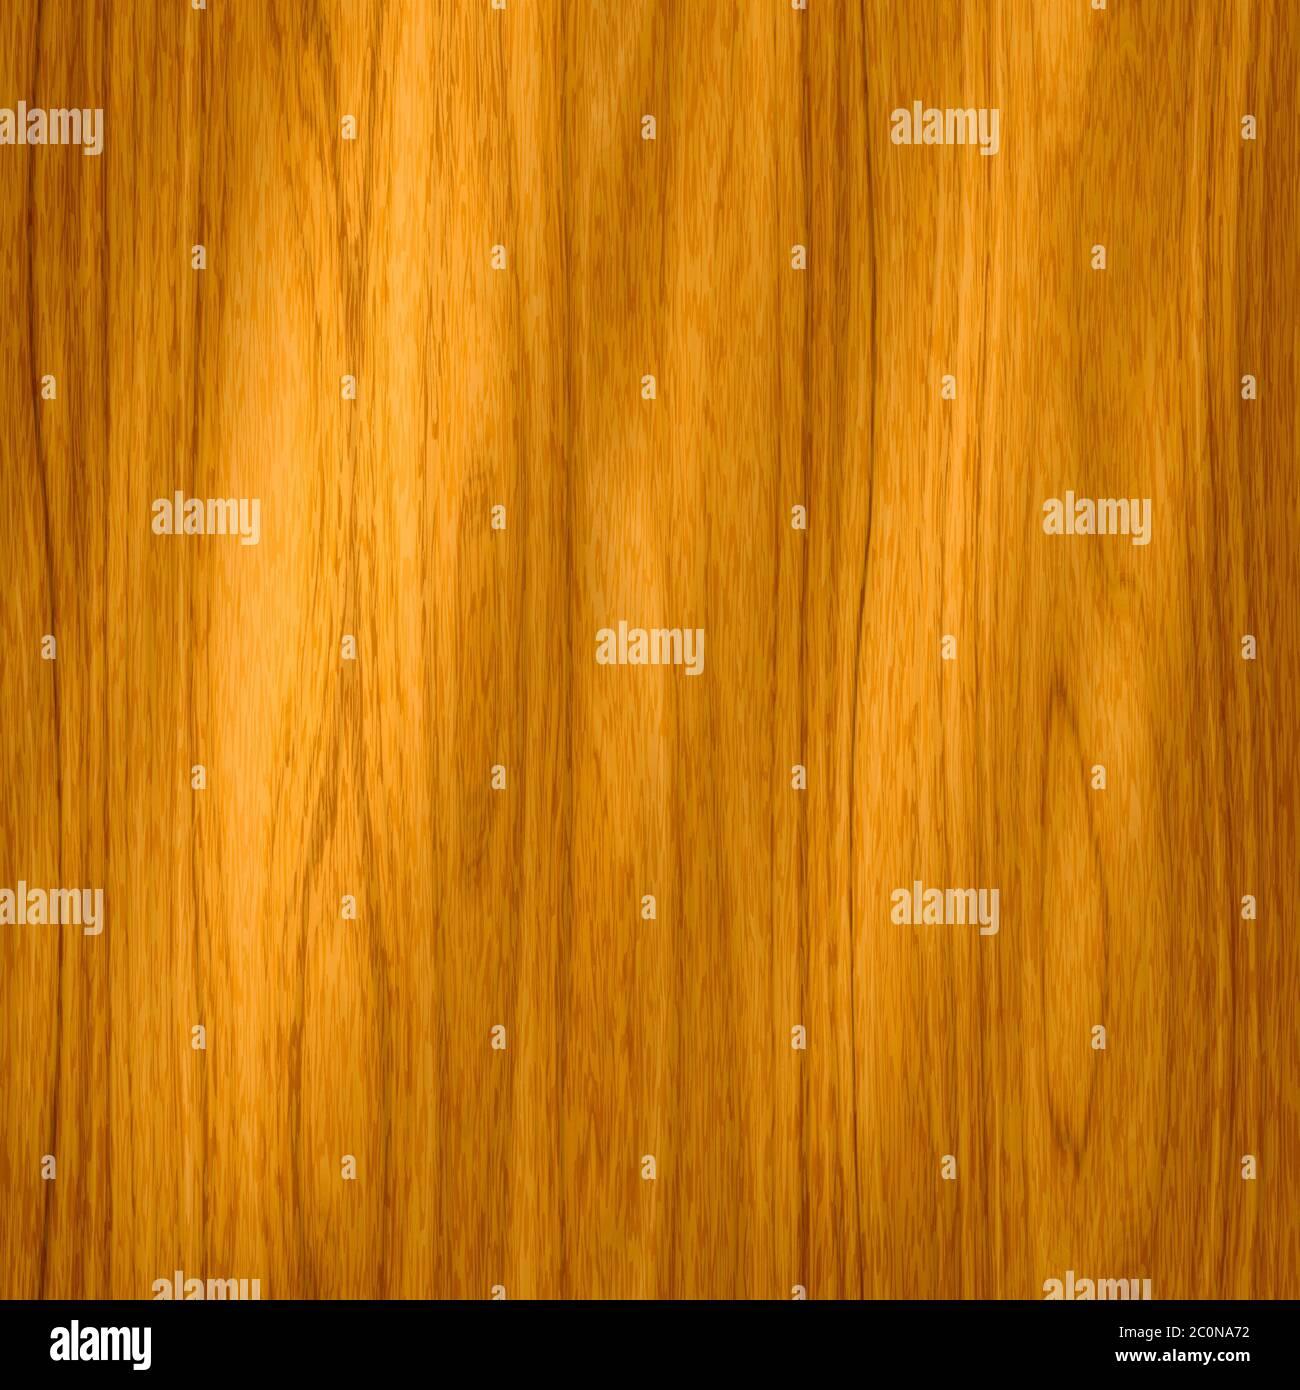 formato cuadrado de fondo de madera Foto de stock